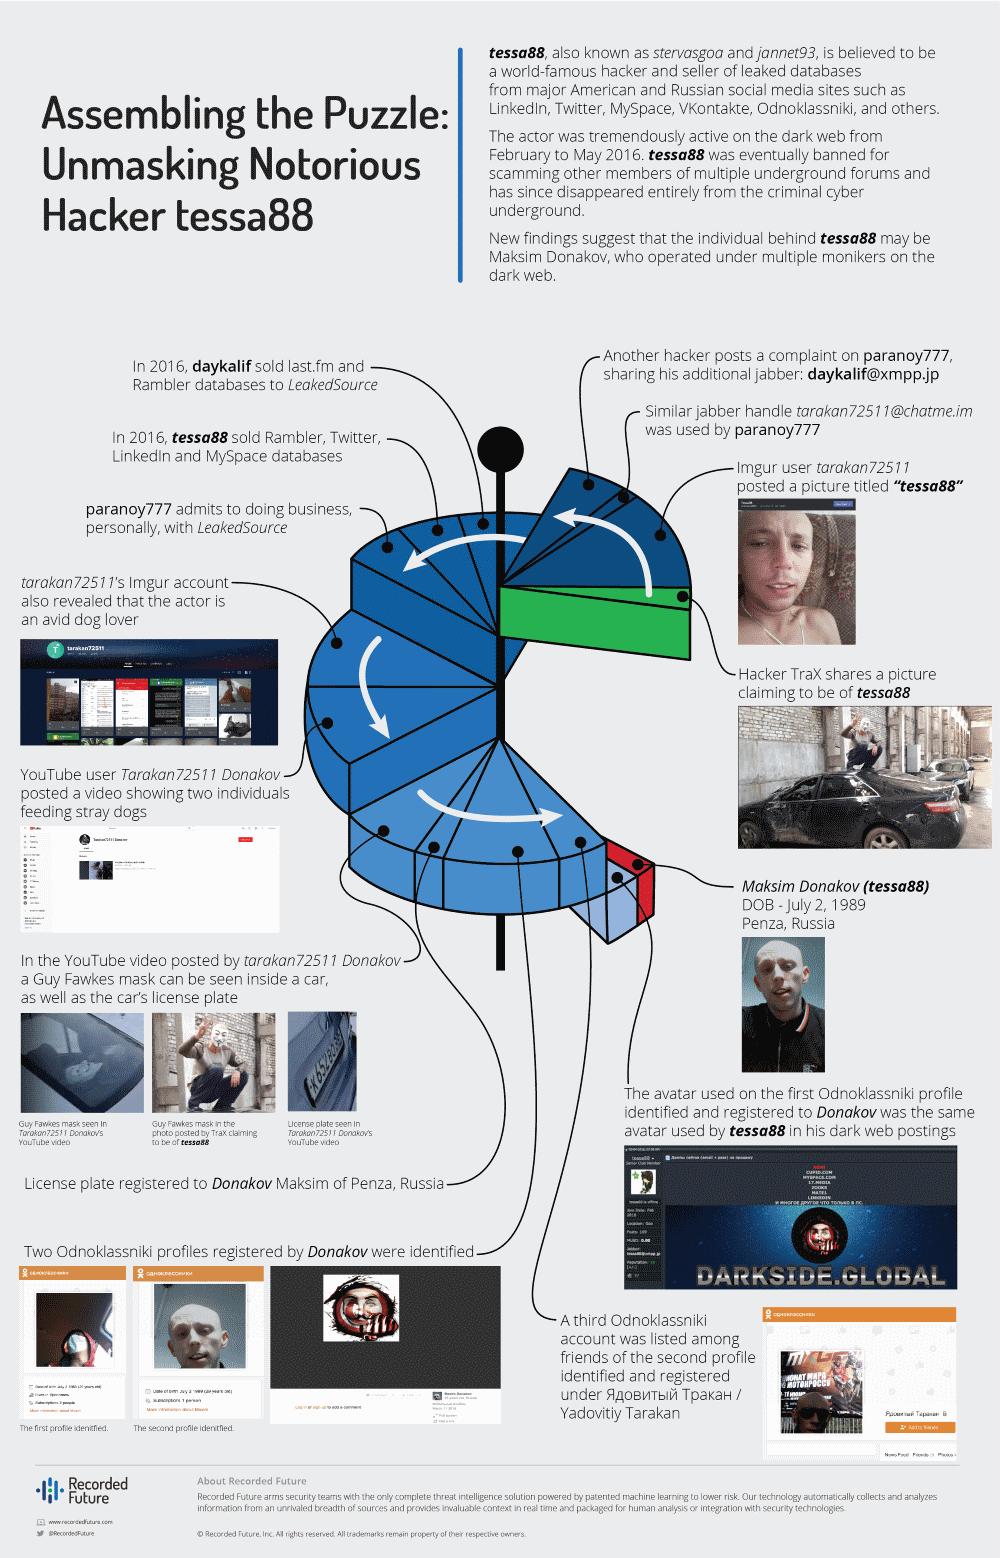 tessa88-identity-revealed.png